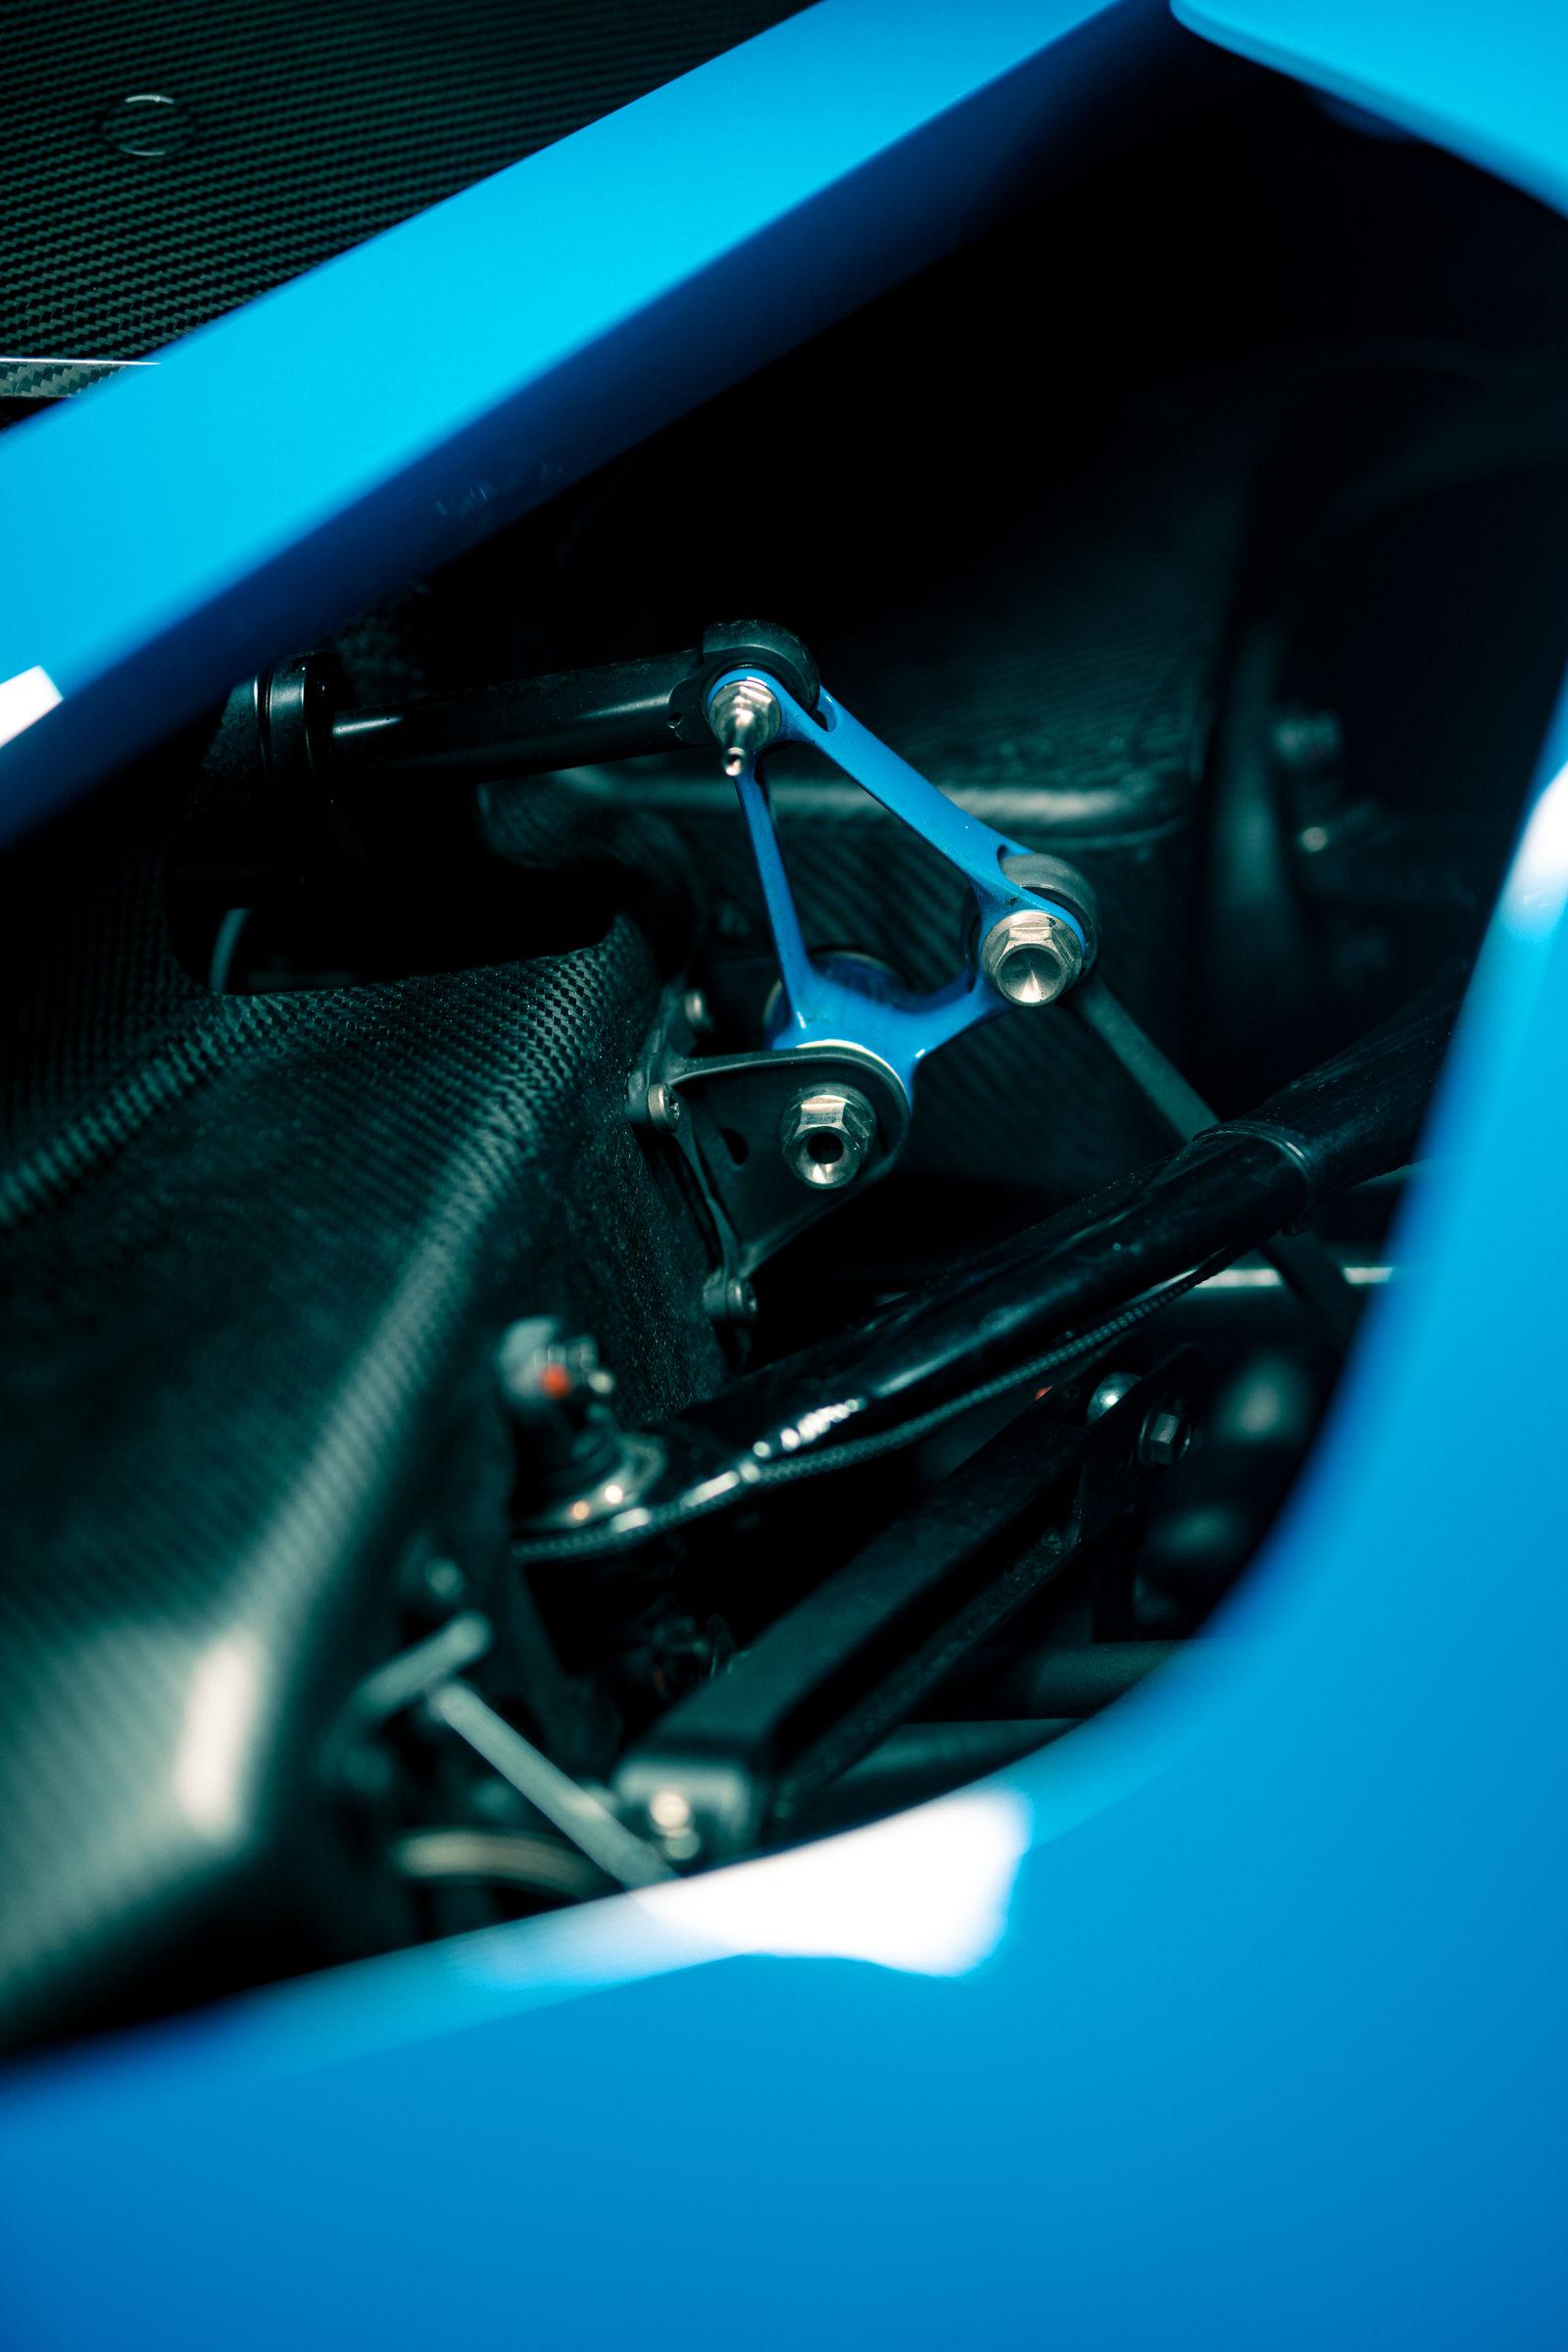 Bugatti-Bolide-concept-photos-22